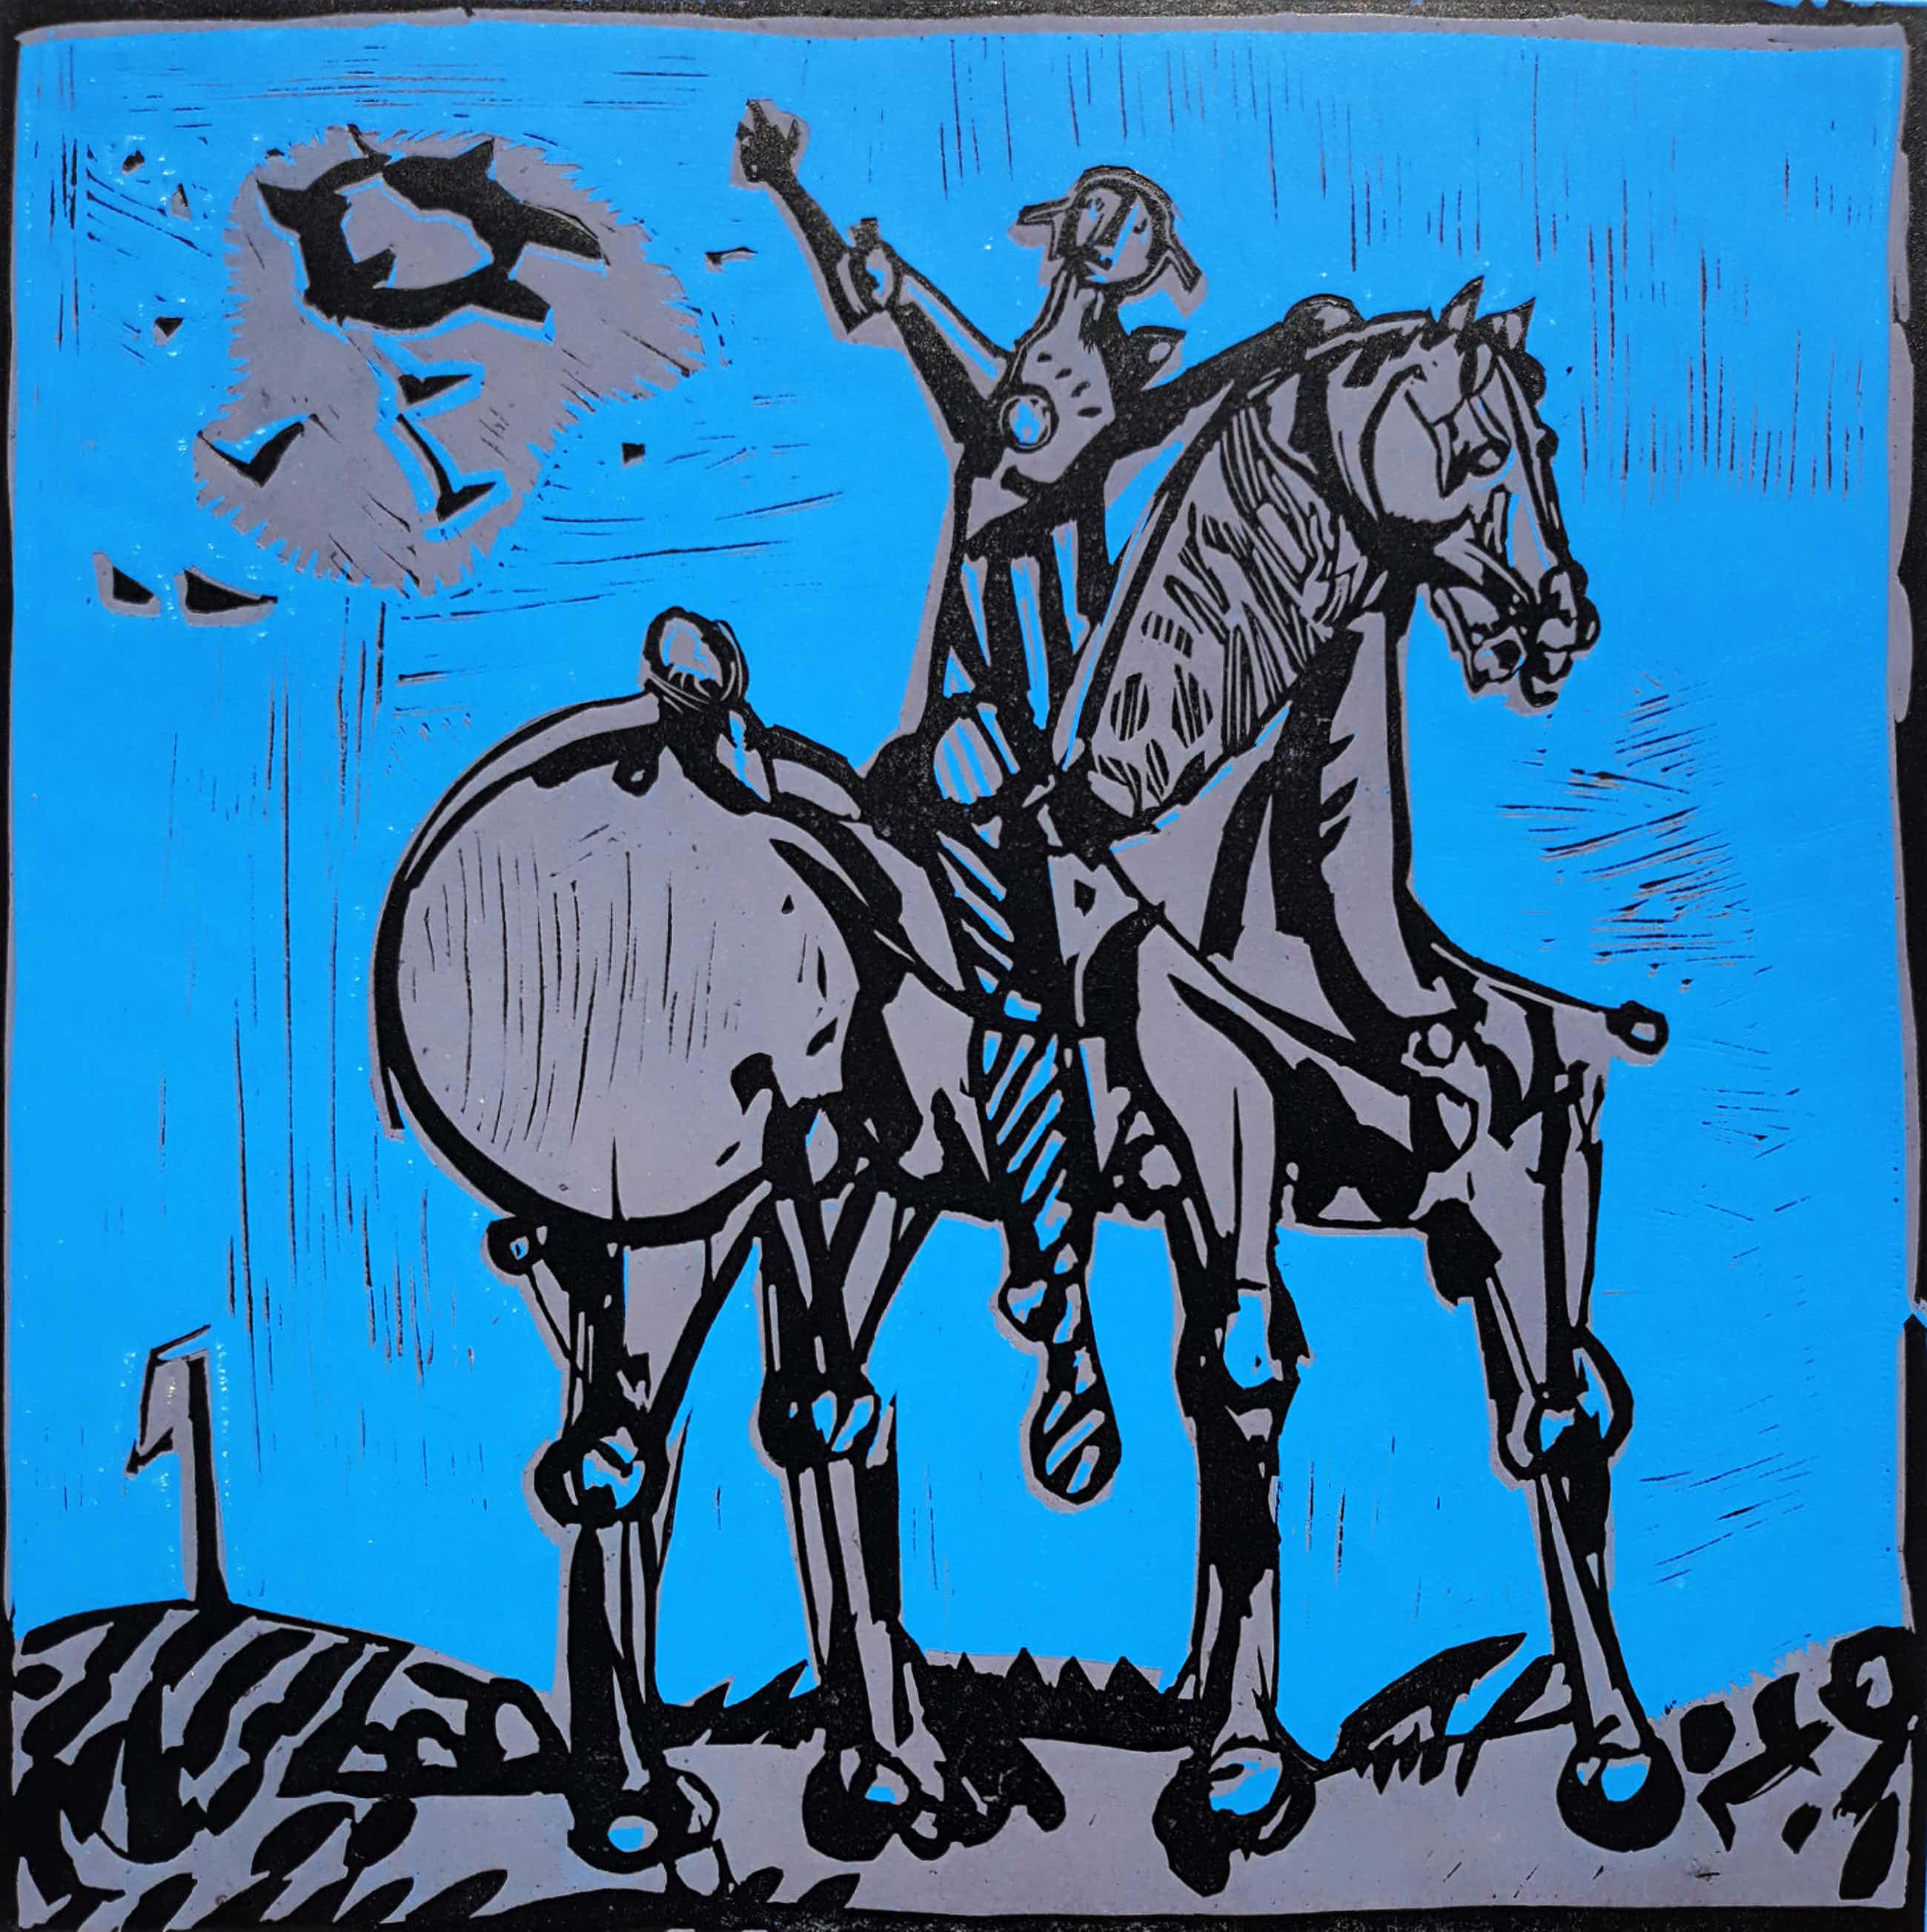 Willem Snitker - Don Quichot, linosnede kopen? Bied vanaf 48!